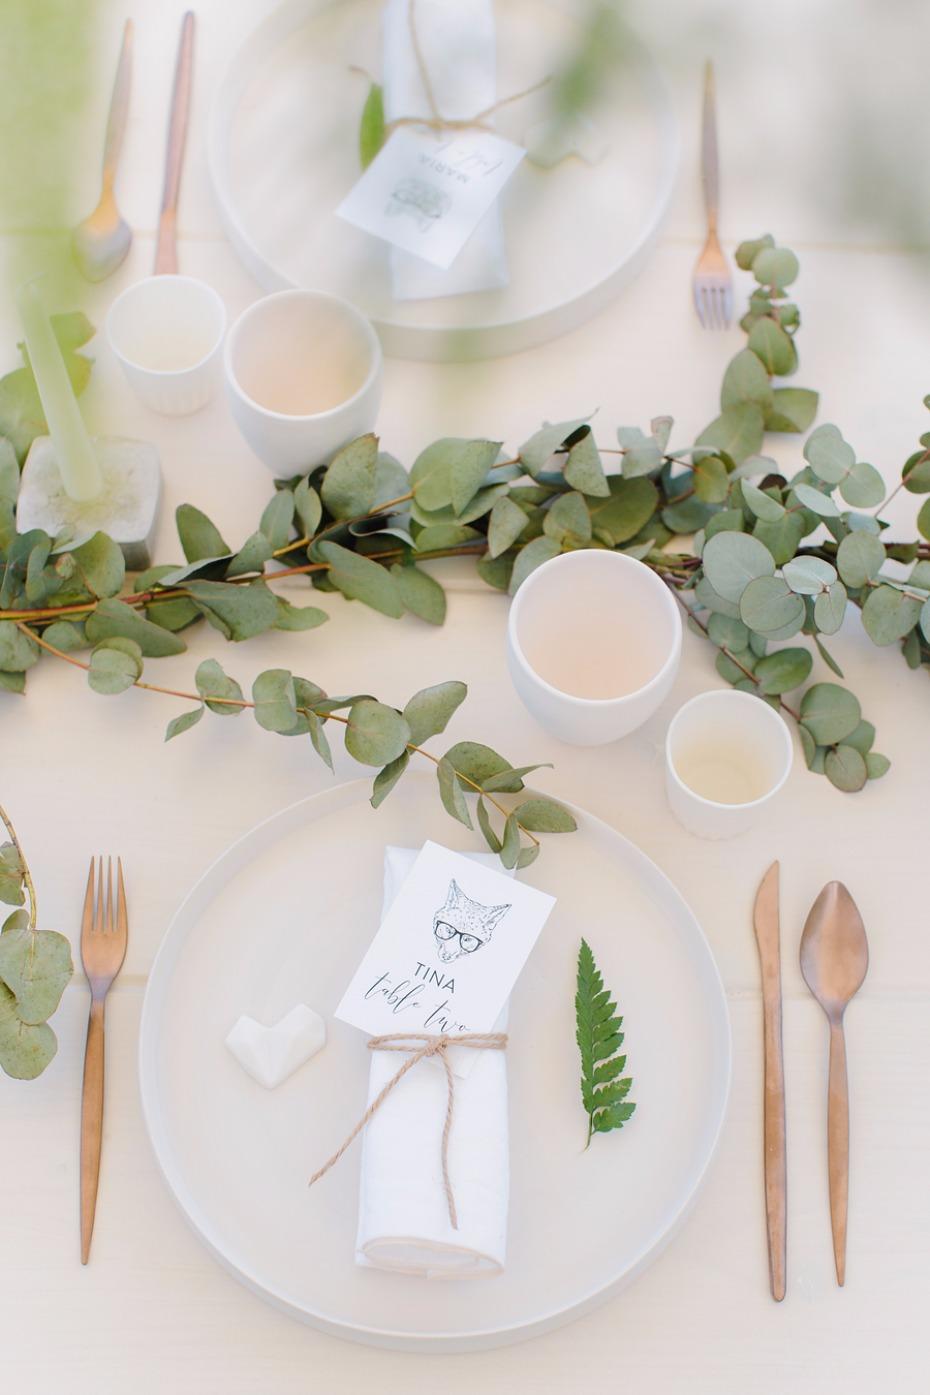 Minimal green,white & bronze table